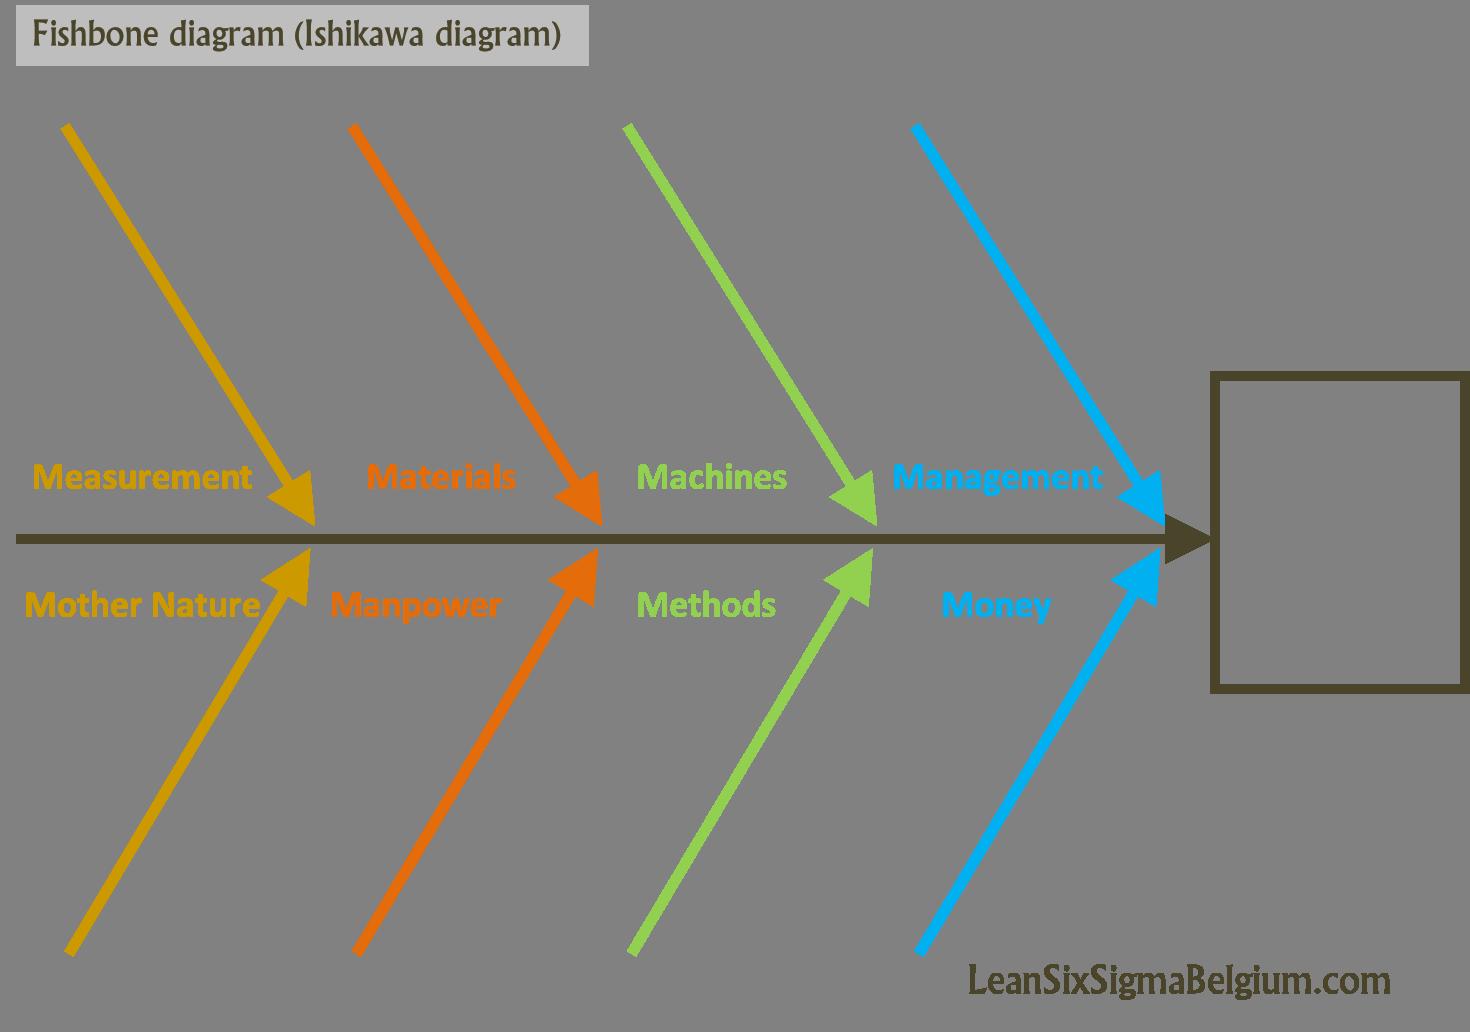 Fishbone diagram ishikawa diagram lean six sigma belgium fishbone diagram ishikawa diagram ccuart Image collections